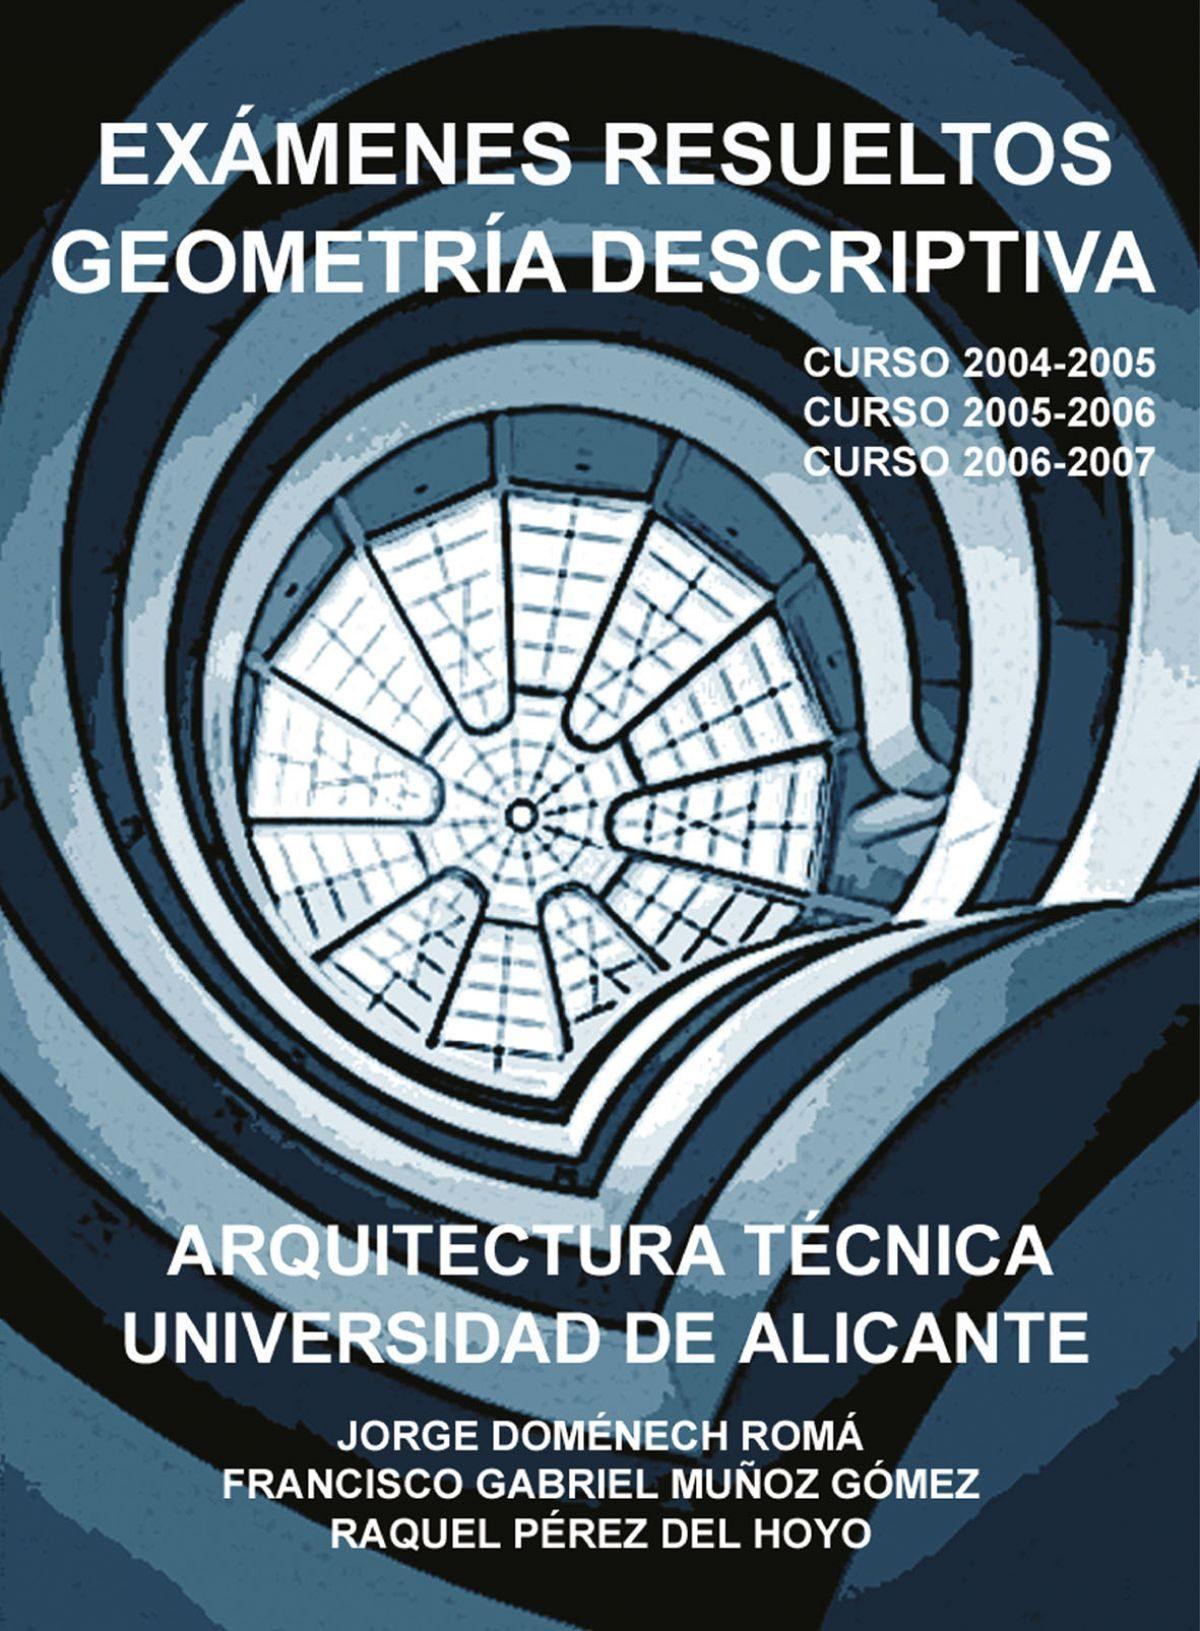 Examenes Resueltos Geometria Descriptiva: Arquitectura Tecnica Un Iver - Domenech Roma Jorge